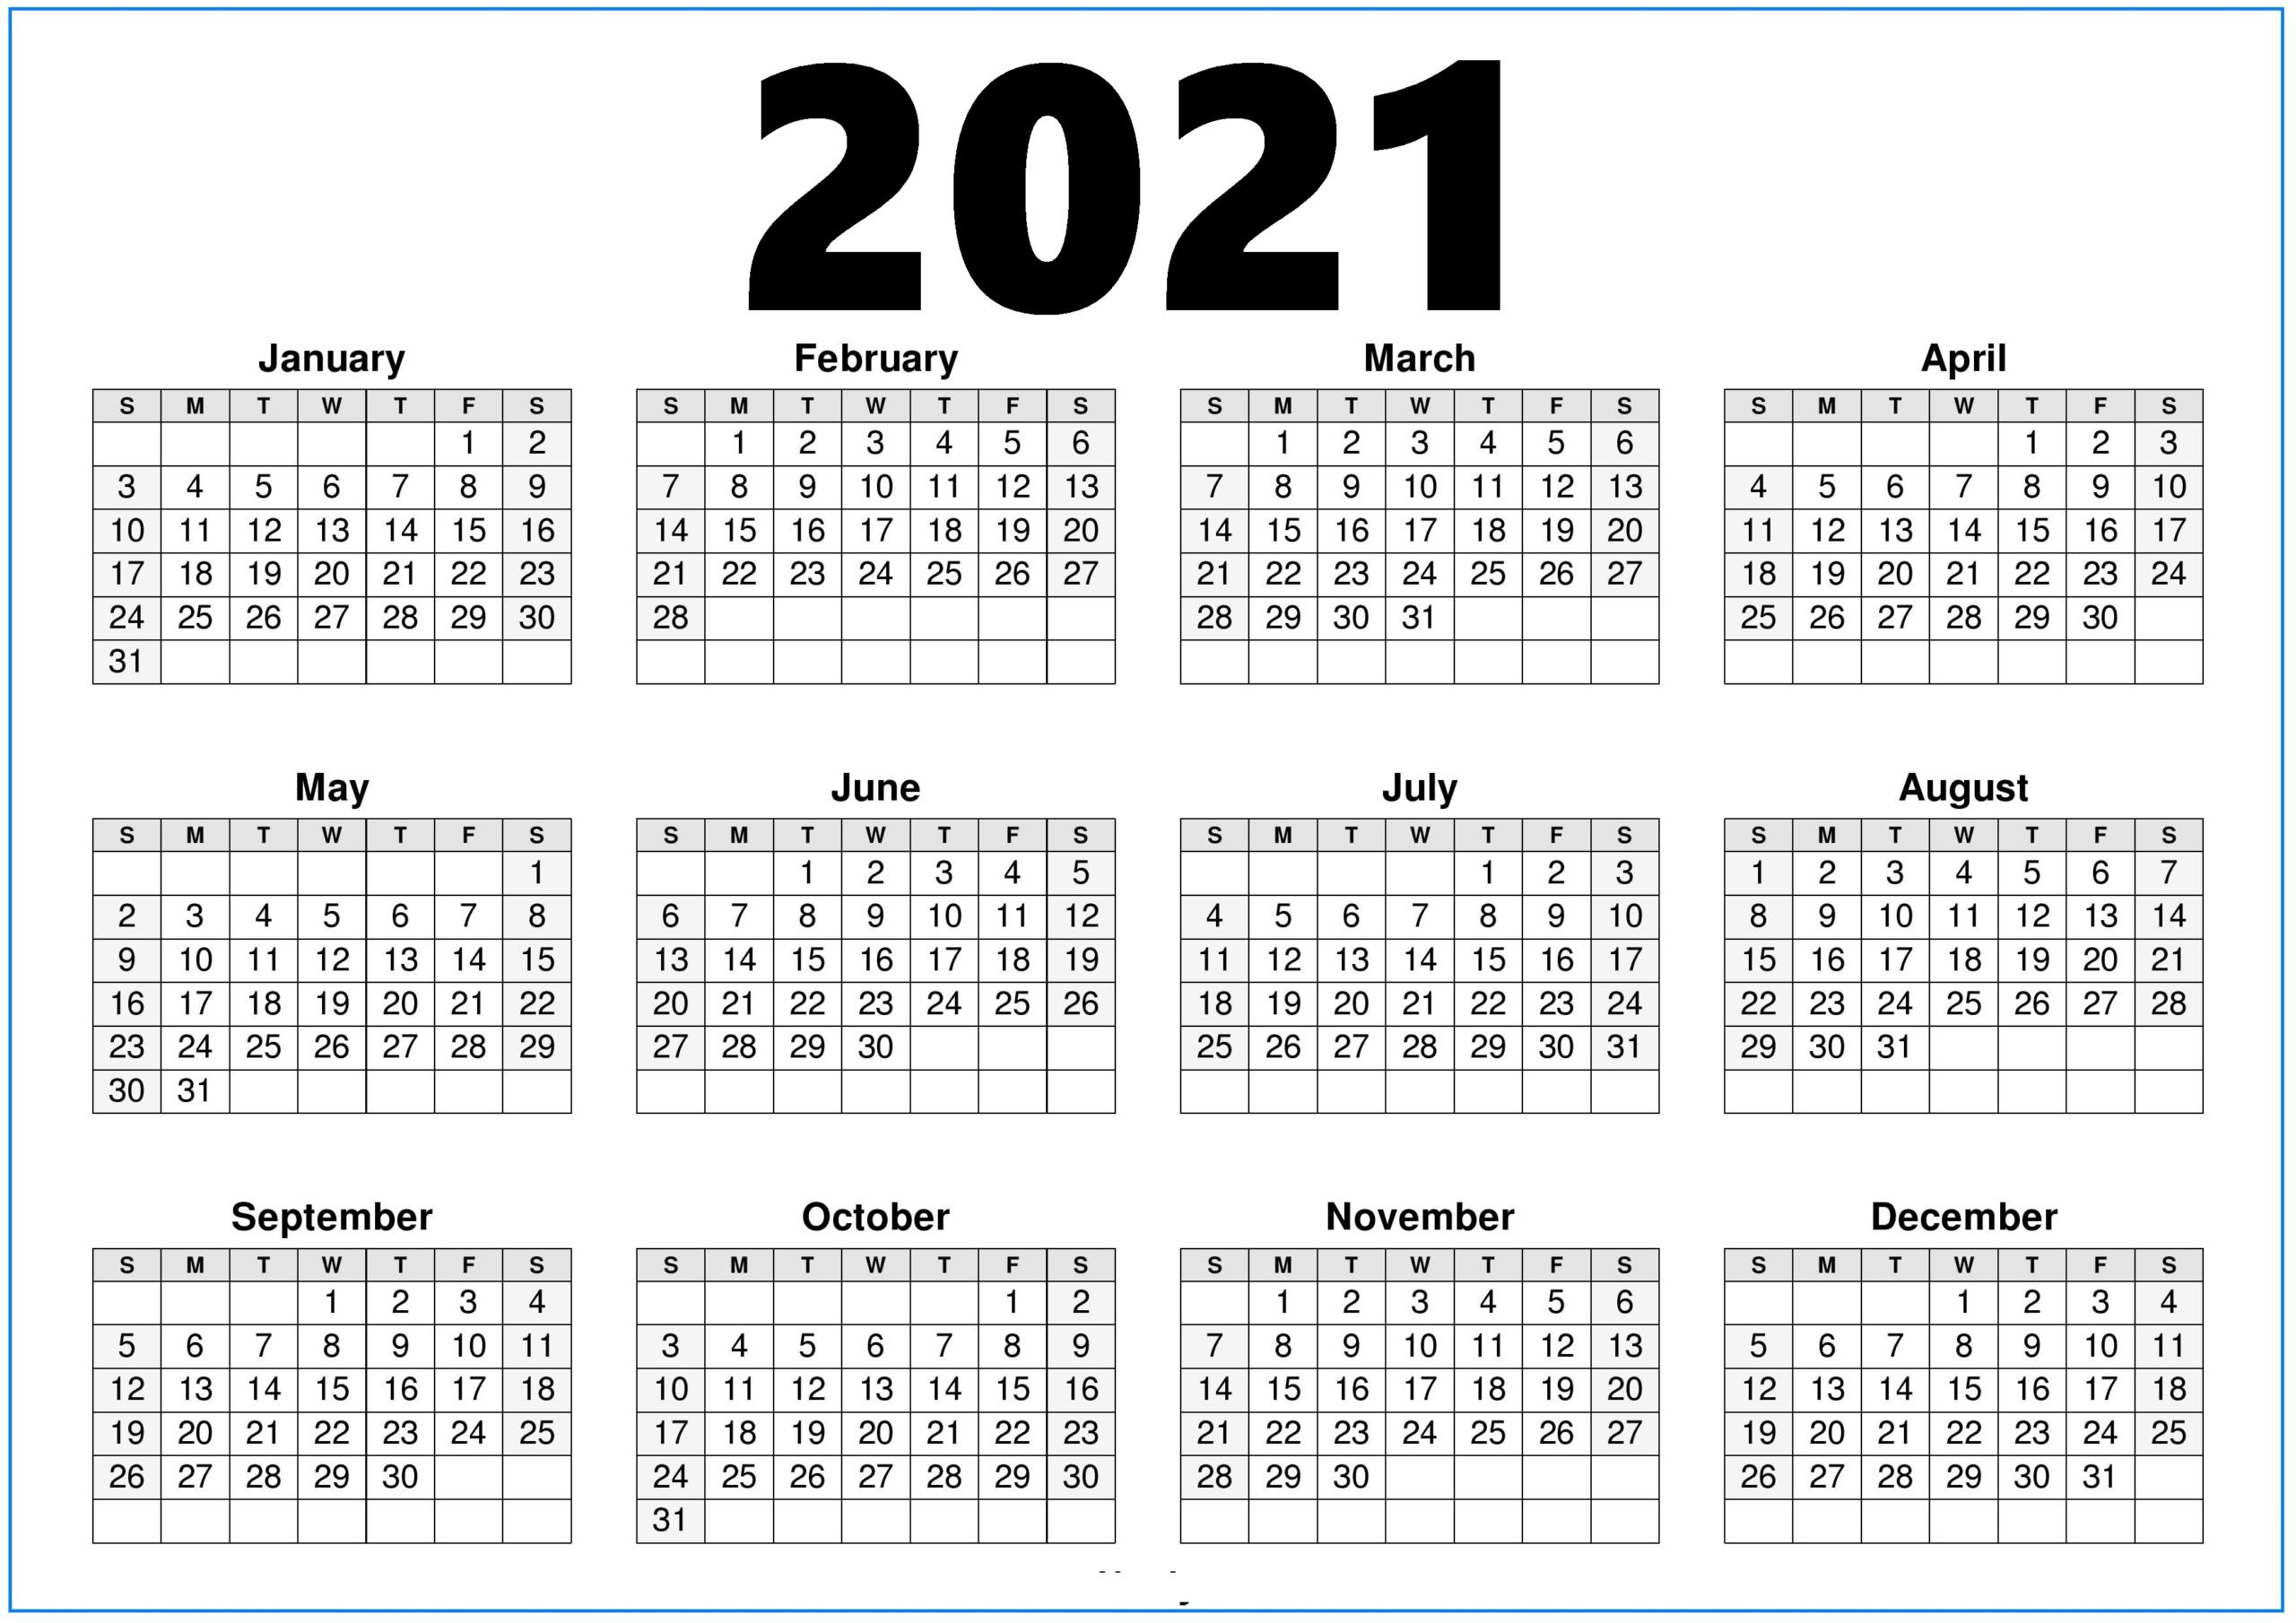 2021 Calendar Printable With Holidays - Printable Calendar